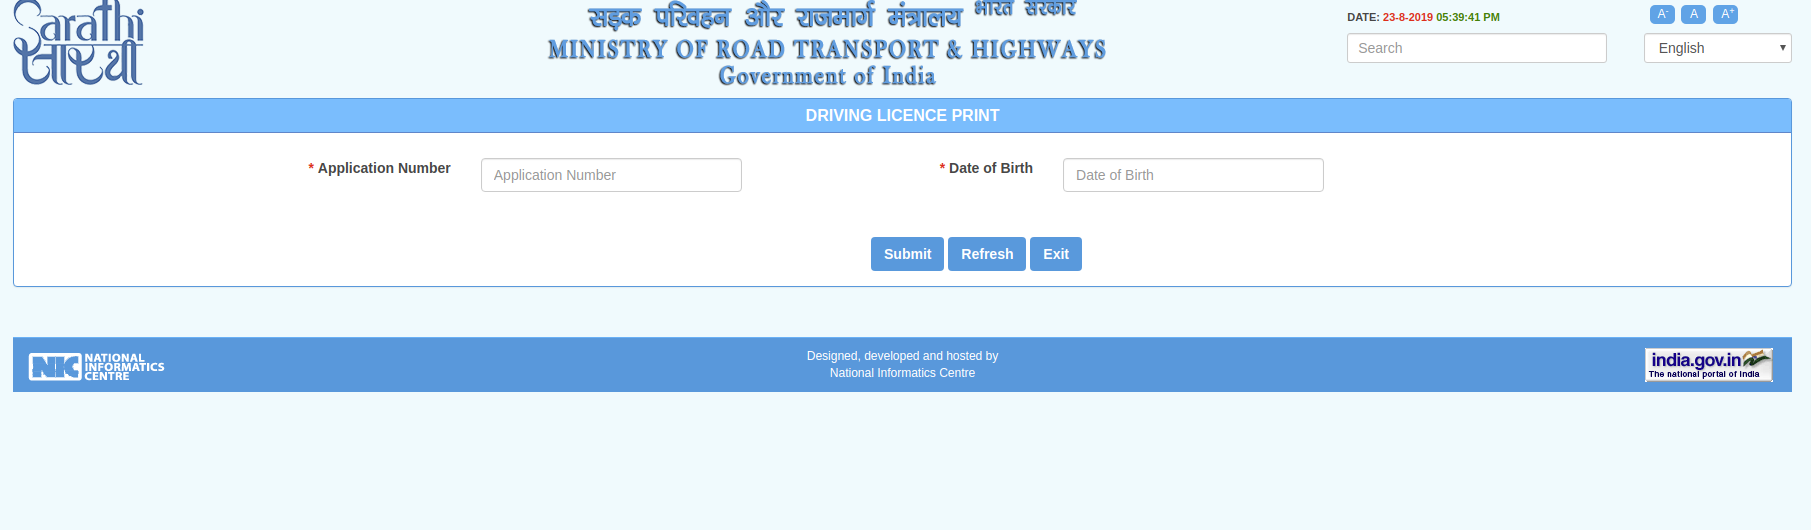 Driving Licence Renewal - Image 18